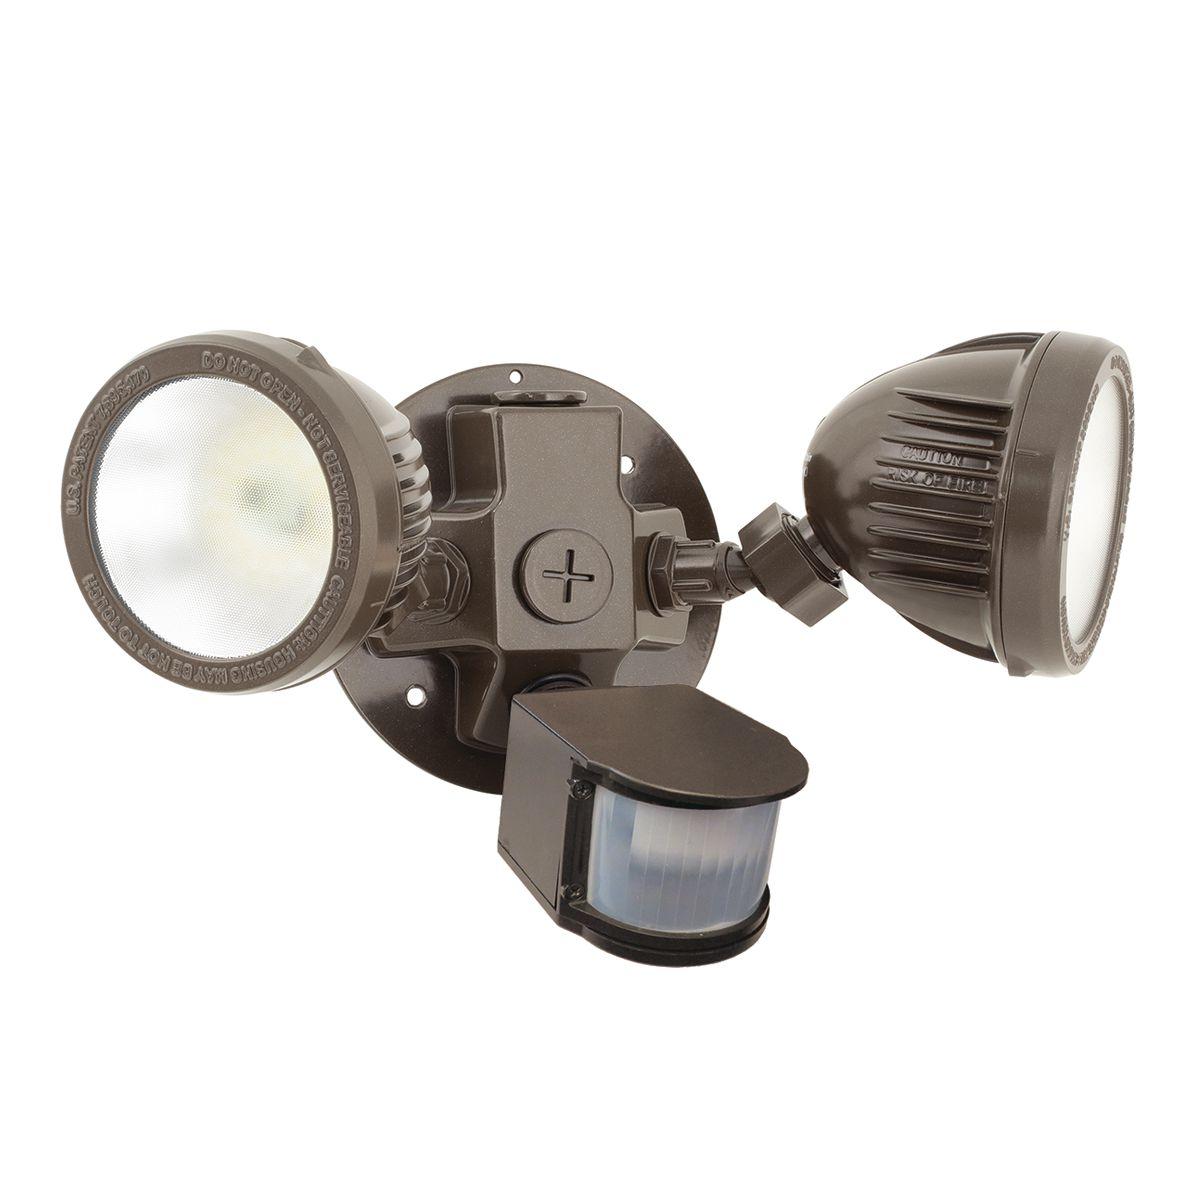 Outdoor Motion Sensor Lighting Fromm